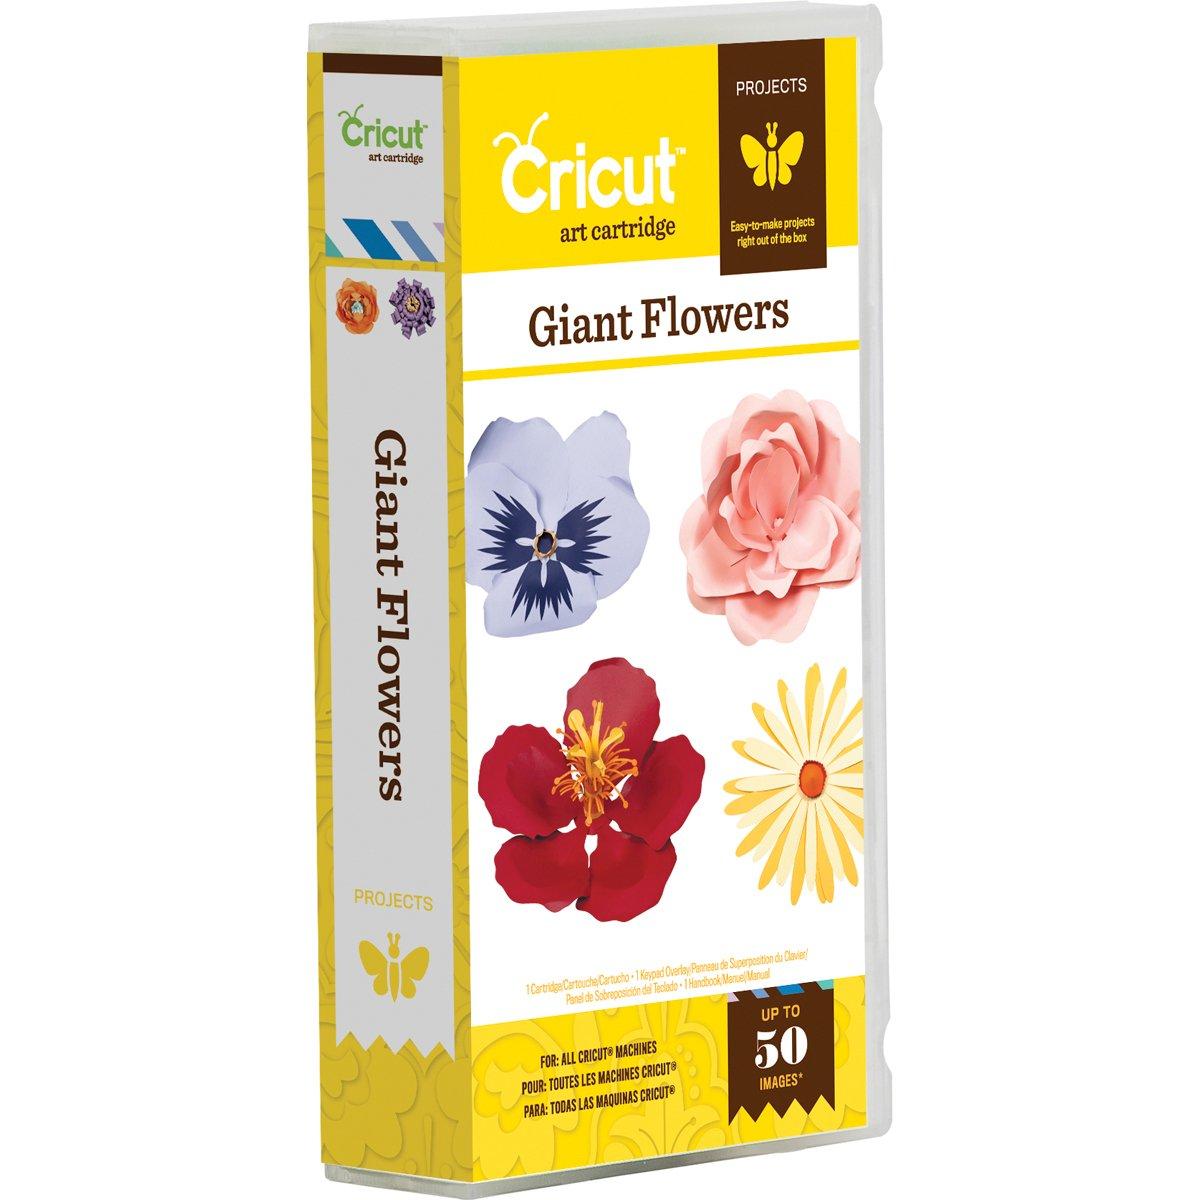 Cricut 2001194 Giant Flowers Cartridge